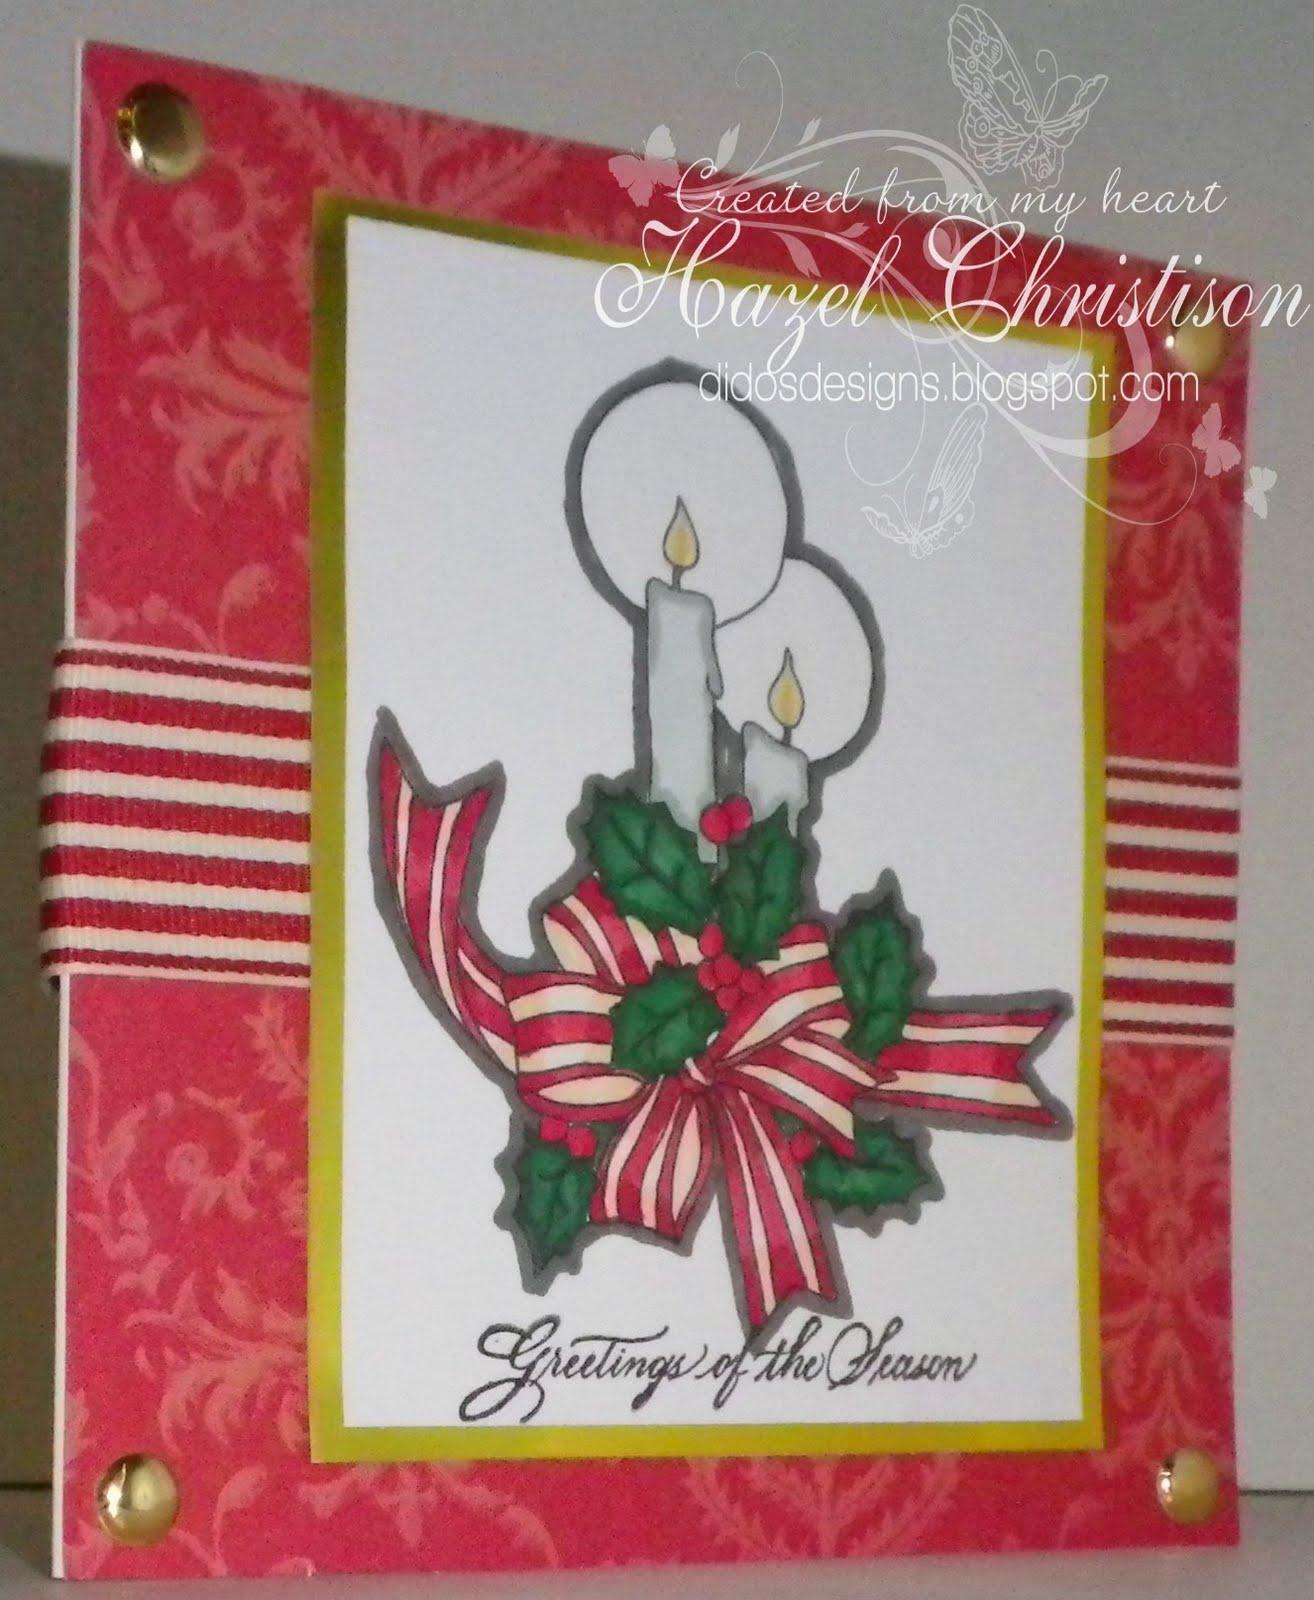 http://1.bp.blogspot.com/-2vdsvQz4Vtc/ThRDFGn8HtI/AAAAAAAAFaU/_tDtuCupdxY/s1600/Cards+By+Dido%2527s+Designs+007.JPG